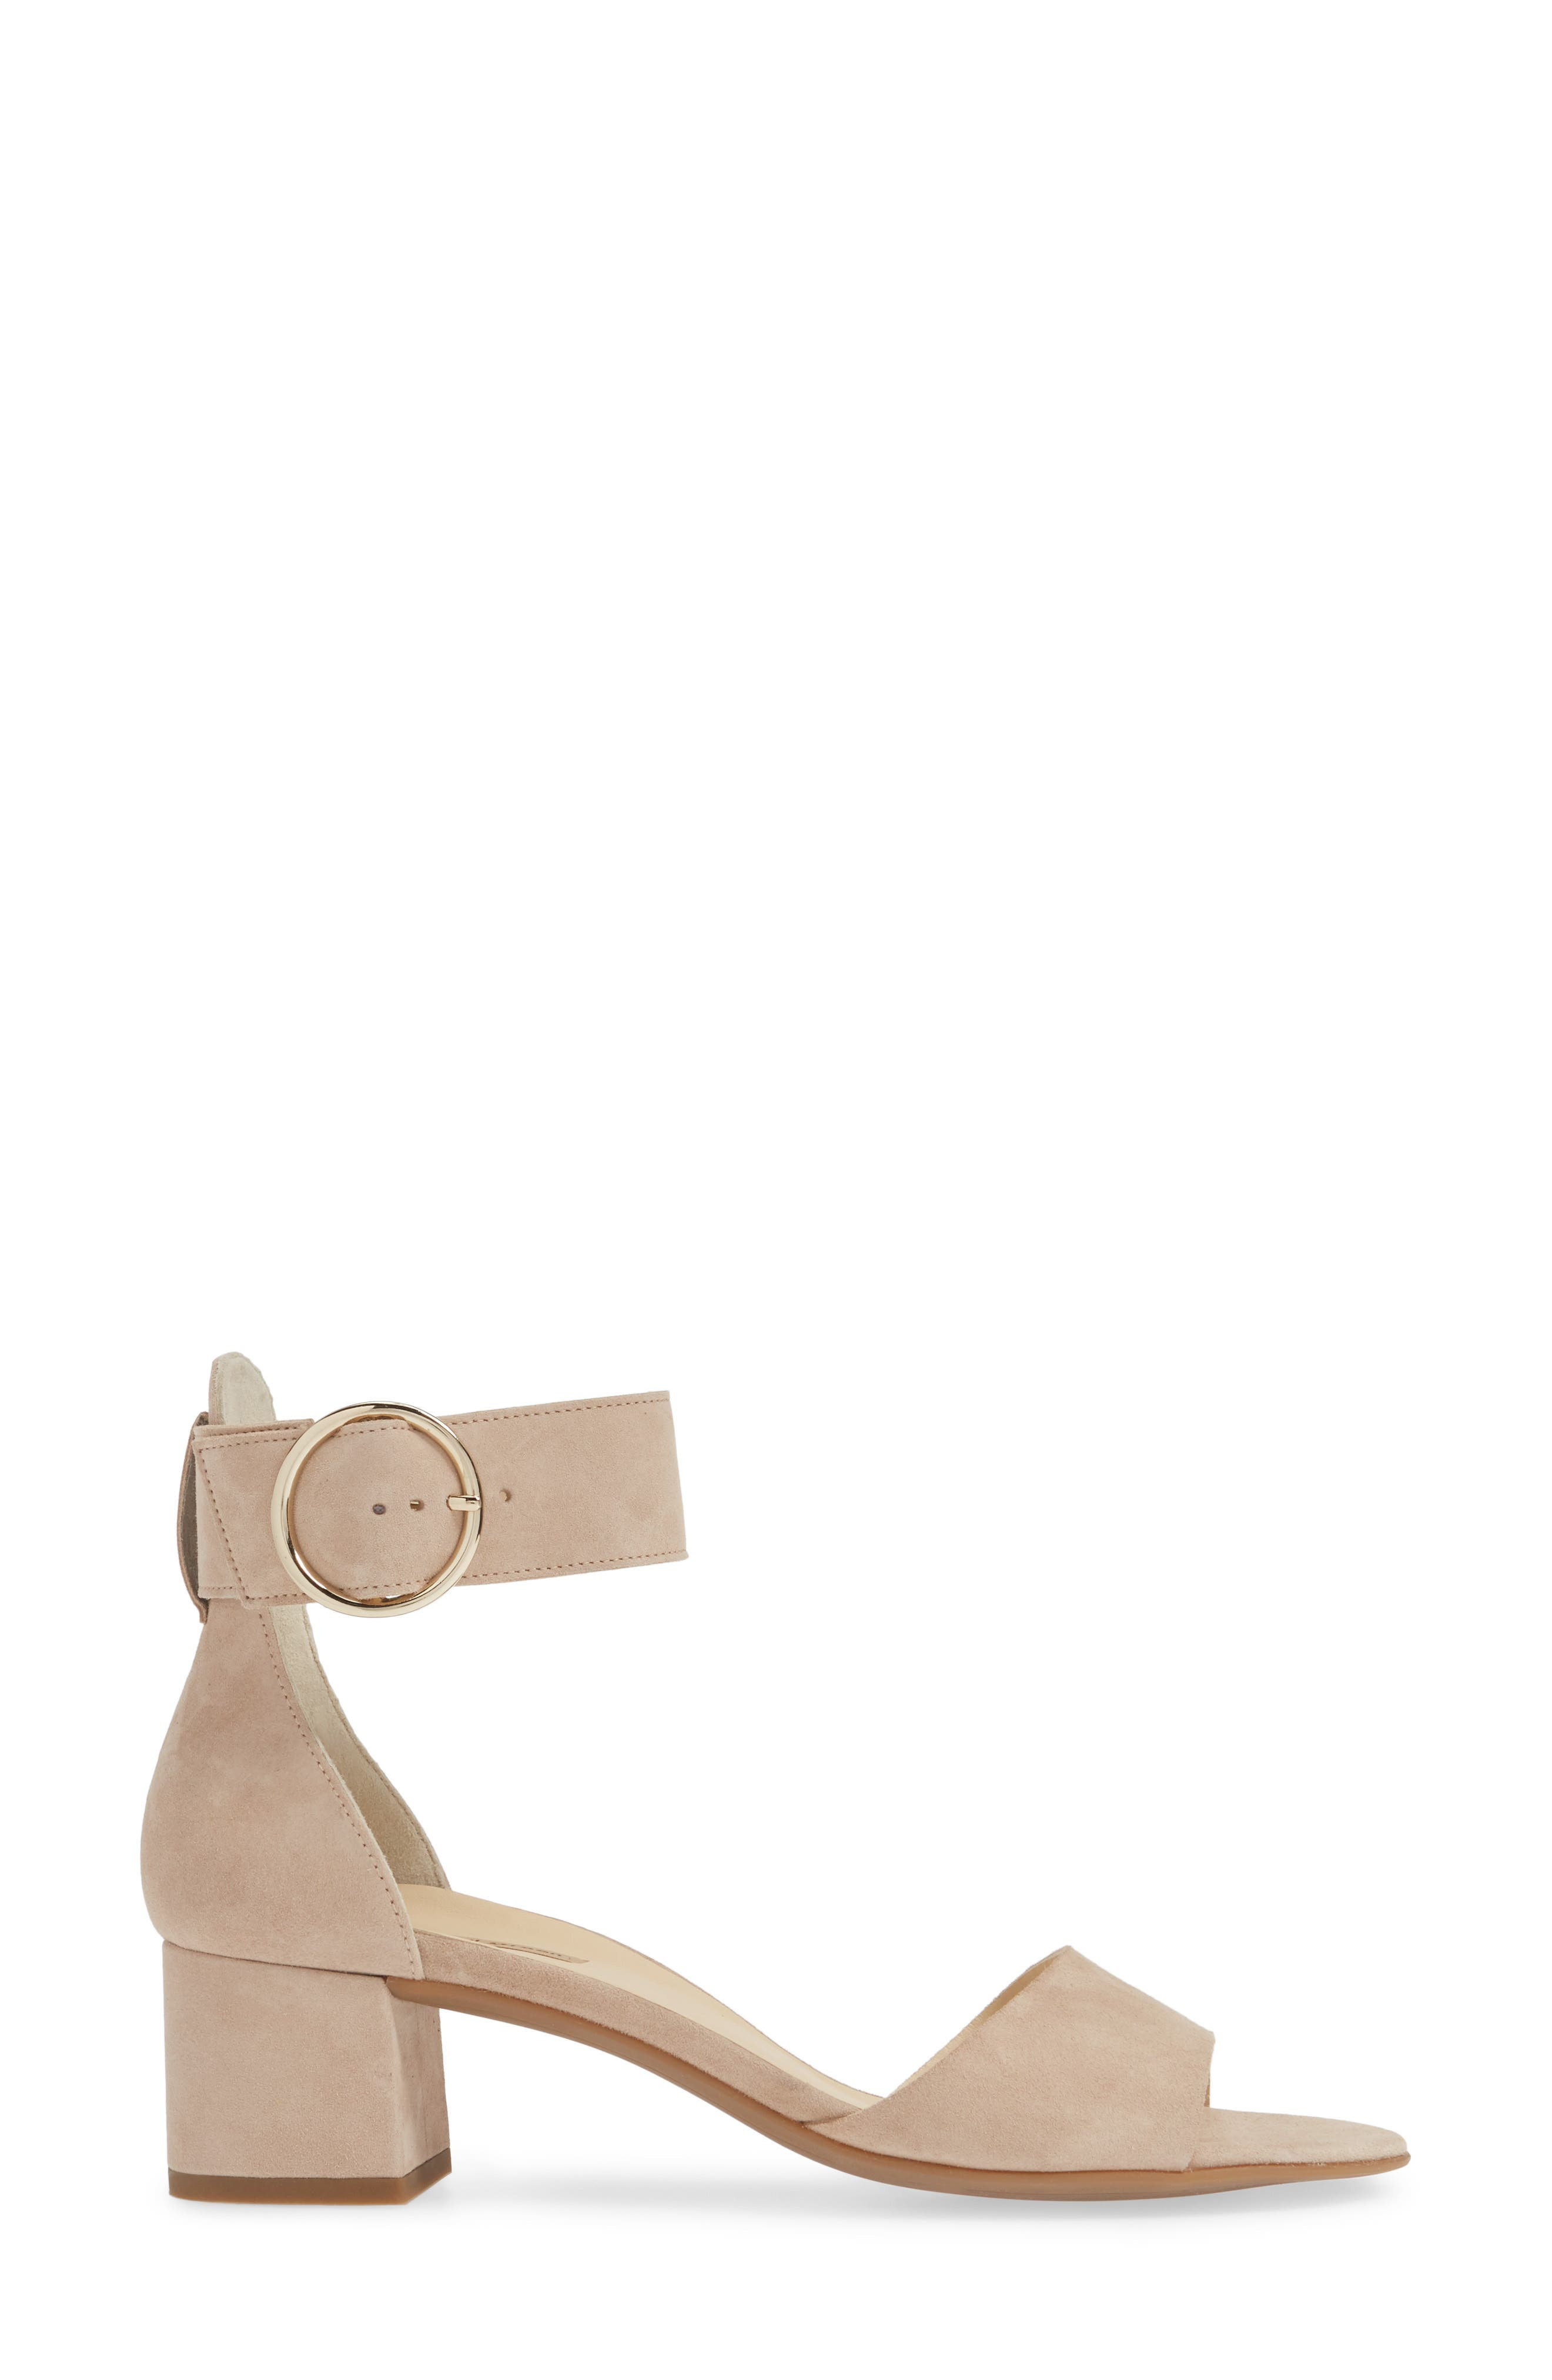 PAUL GREEN, Velma Ankle Strap Sandal, Alternate thumbnail 3, color, SAHARA SUEDE